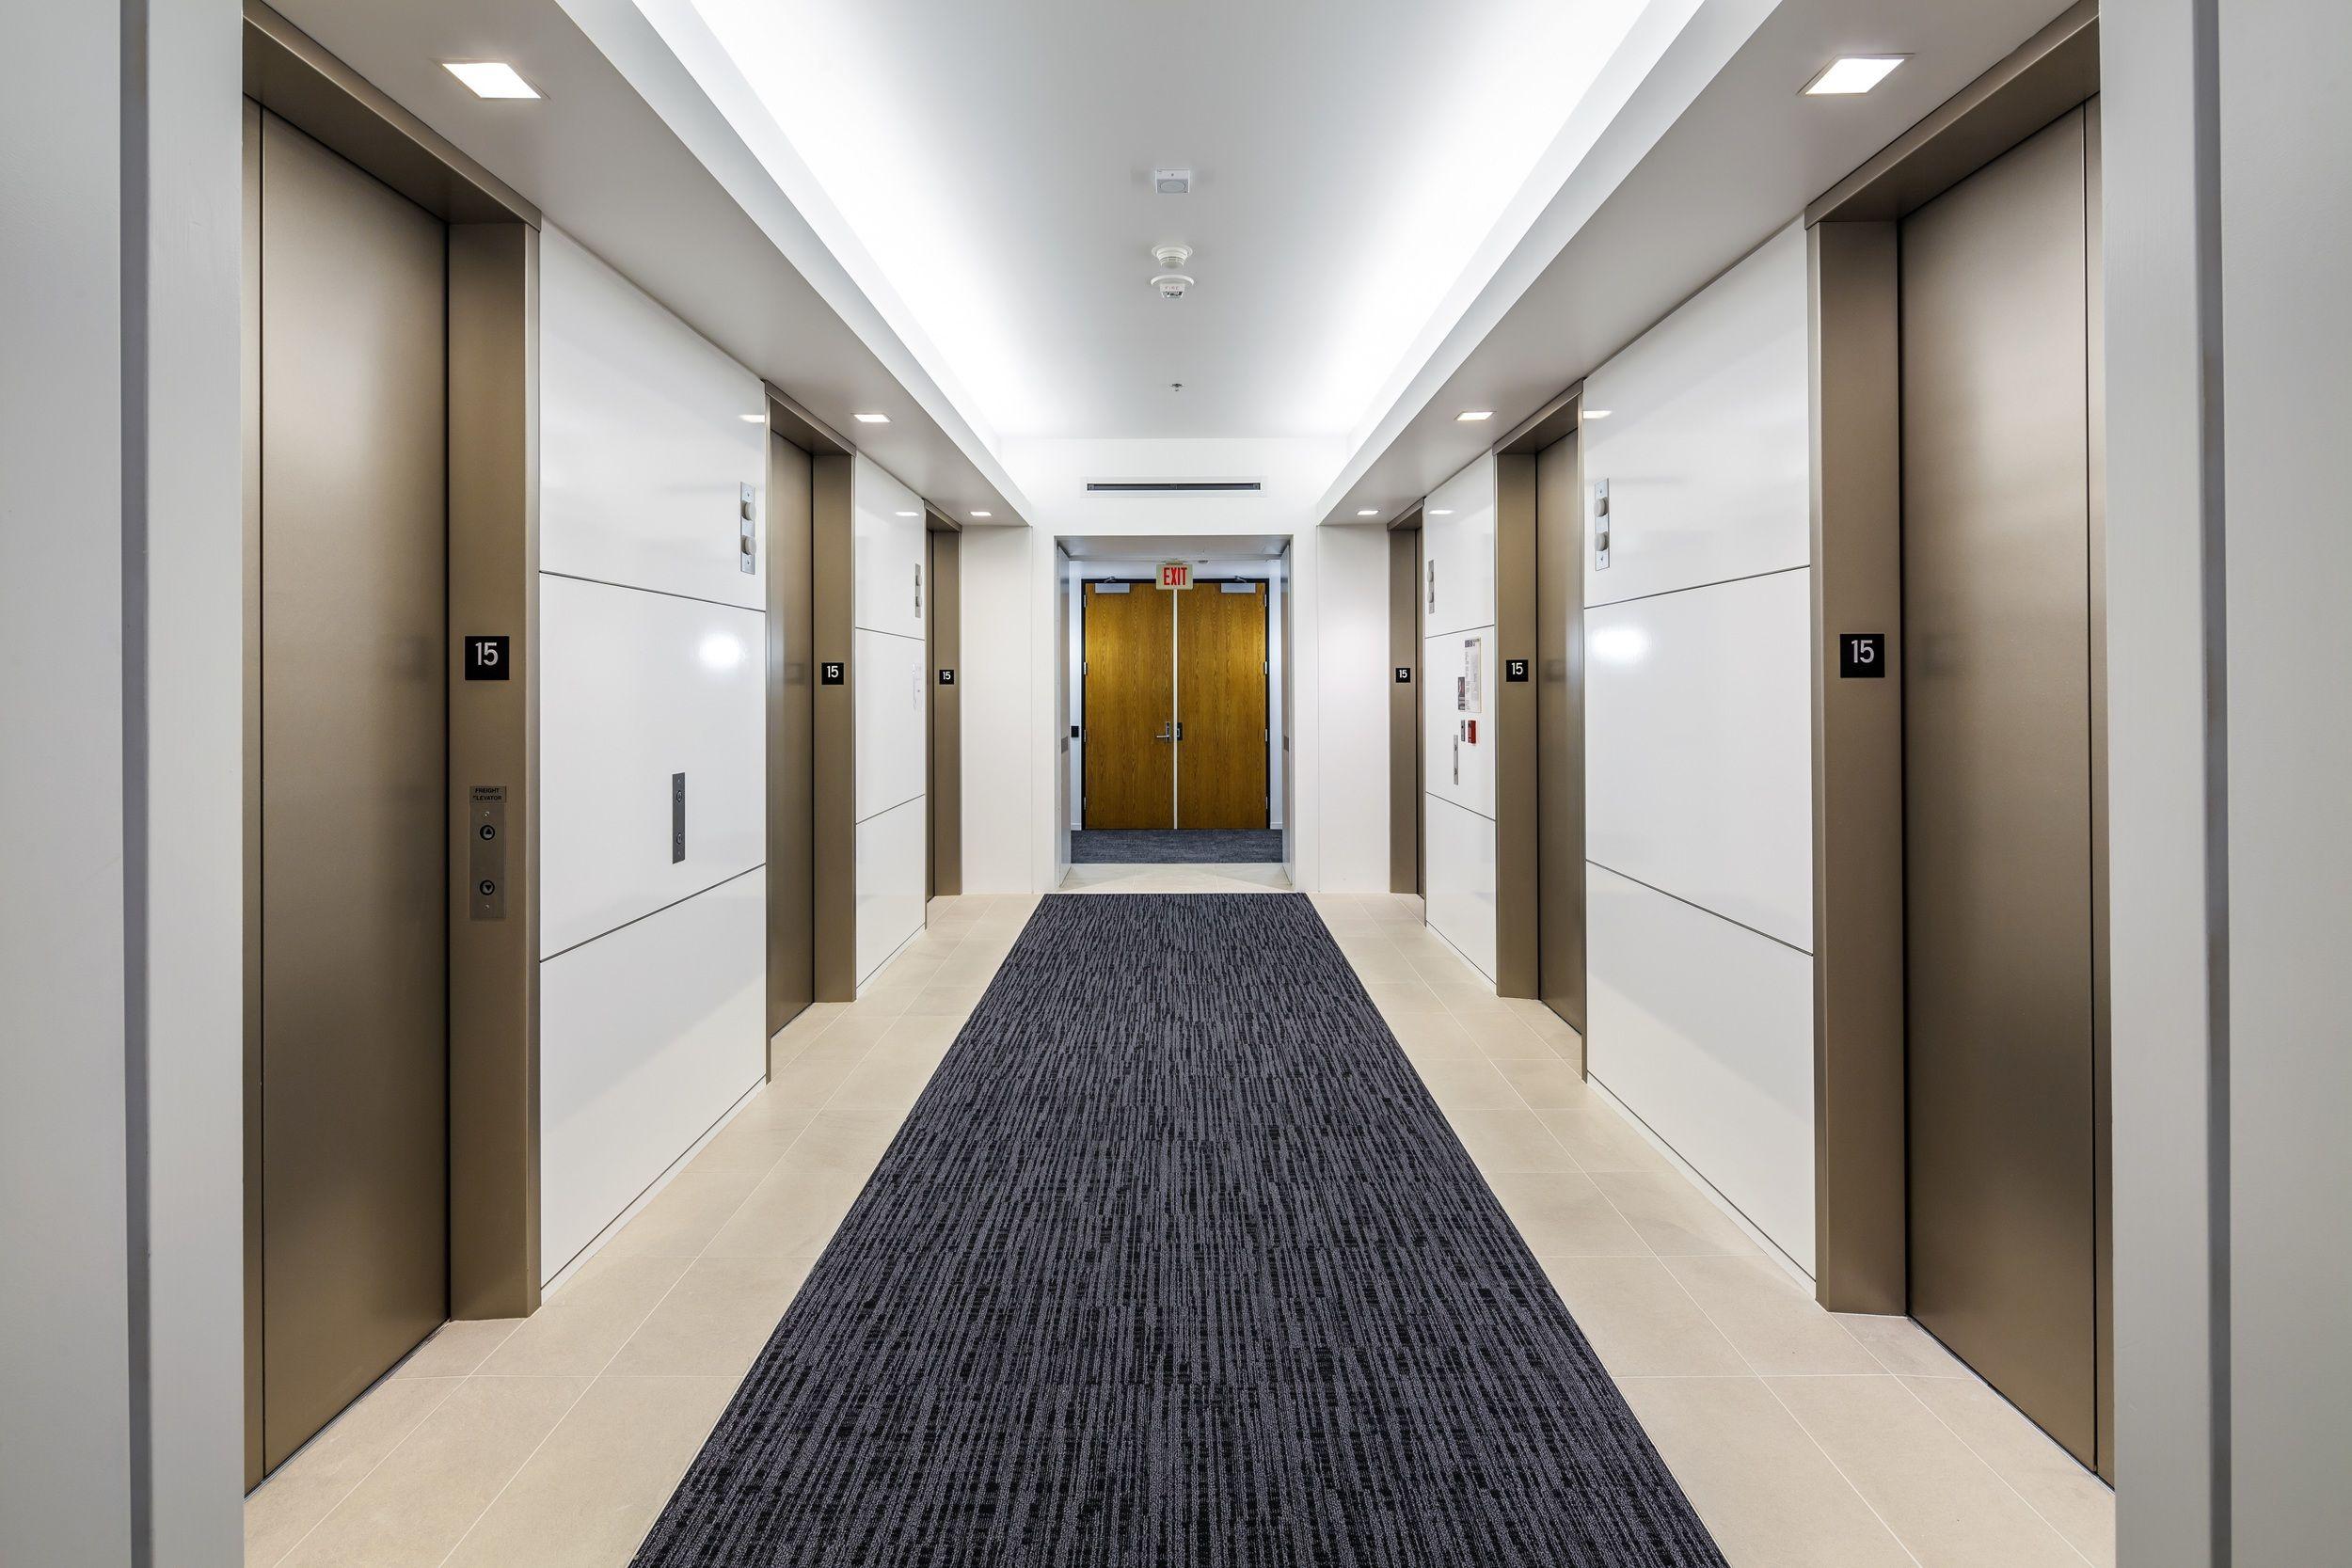 elevator lobbies - Google Search | corporate elevator ...